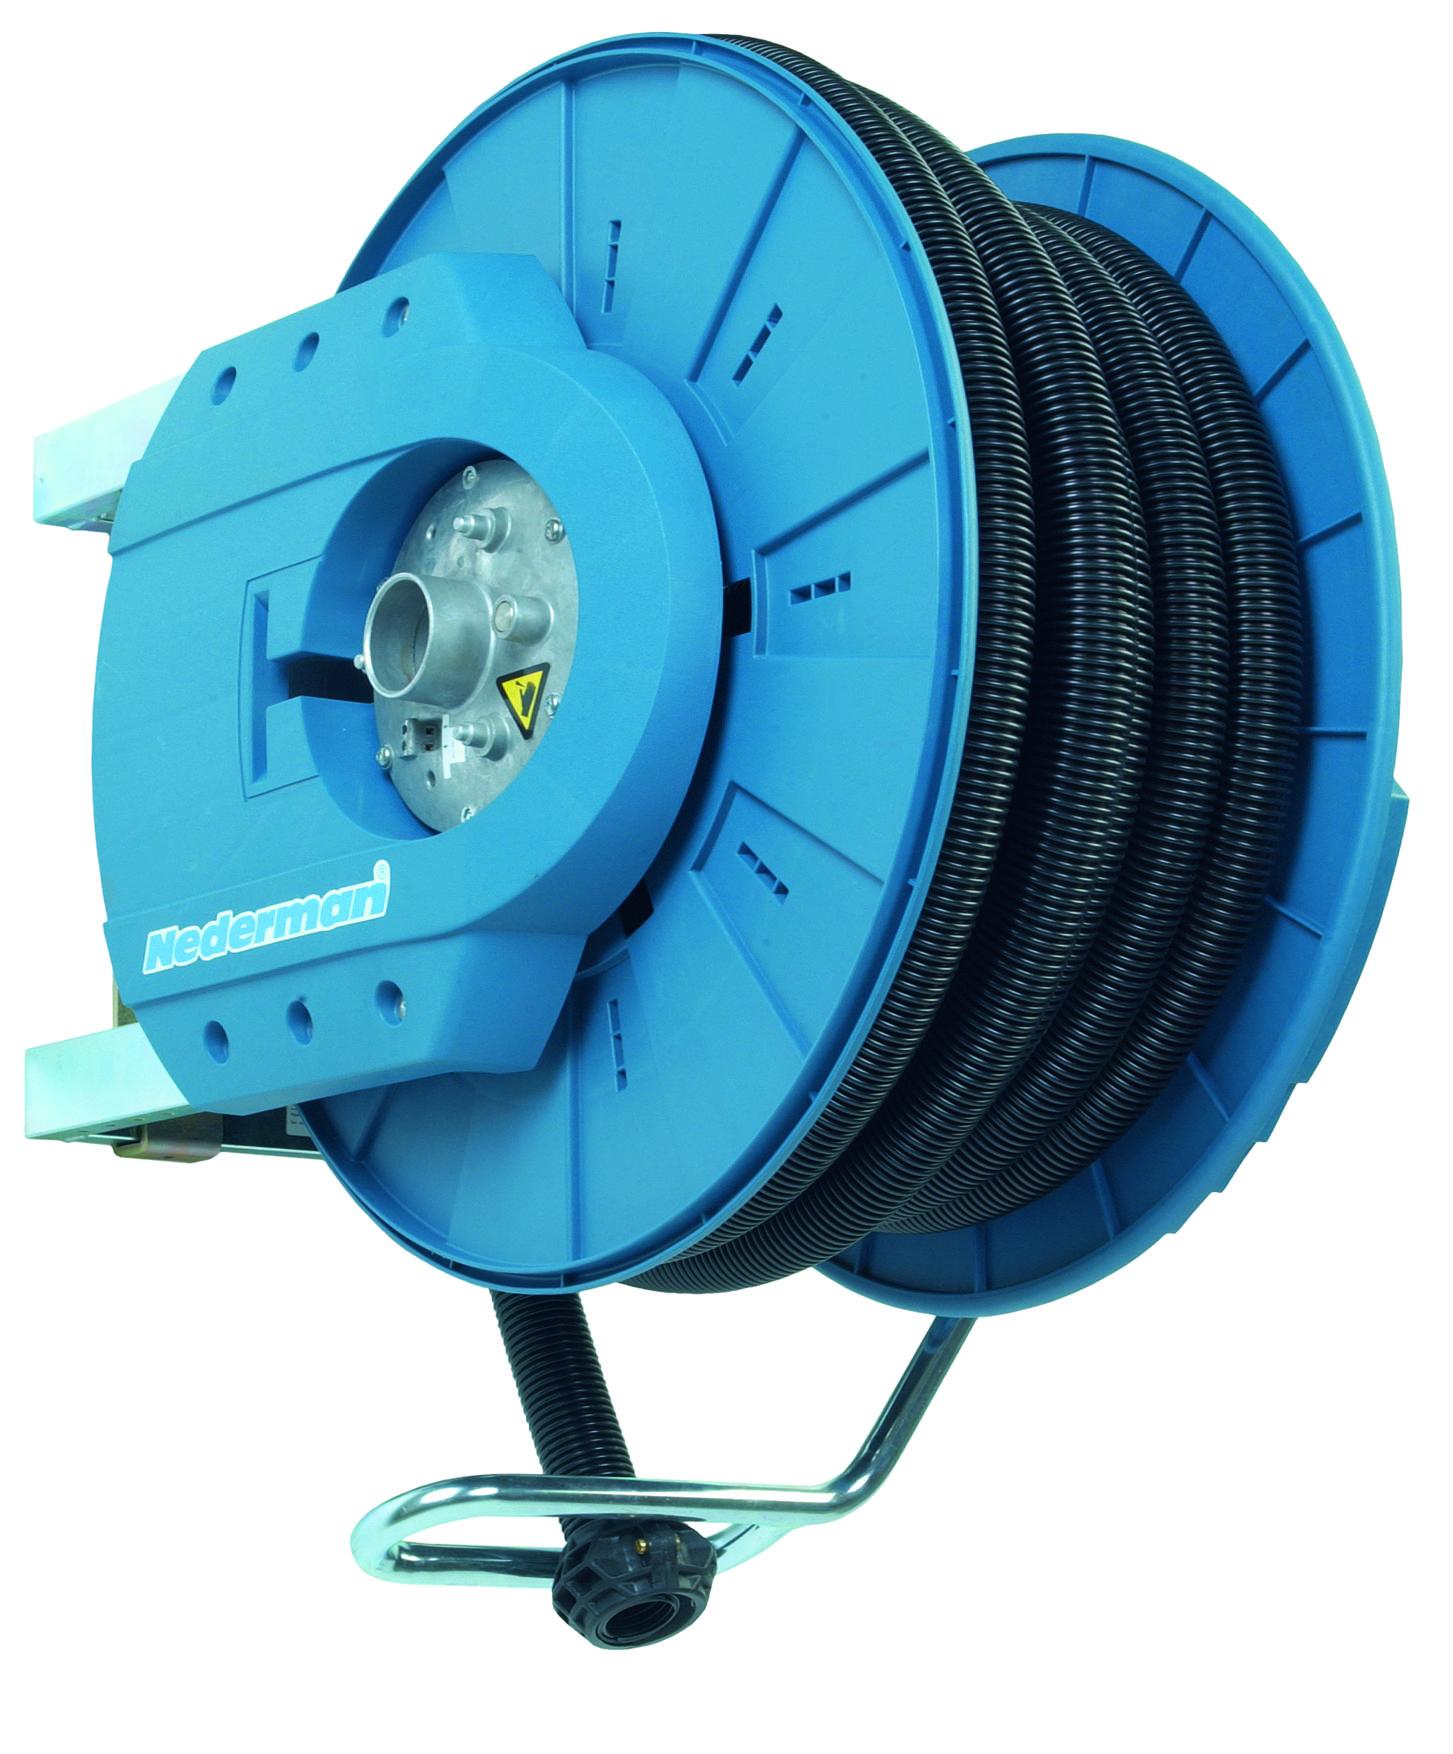 881-vacuum-hose-reel-ex_23152503670_o.jpg